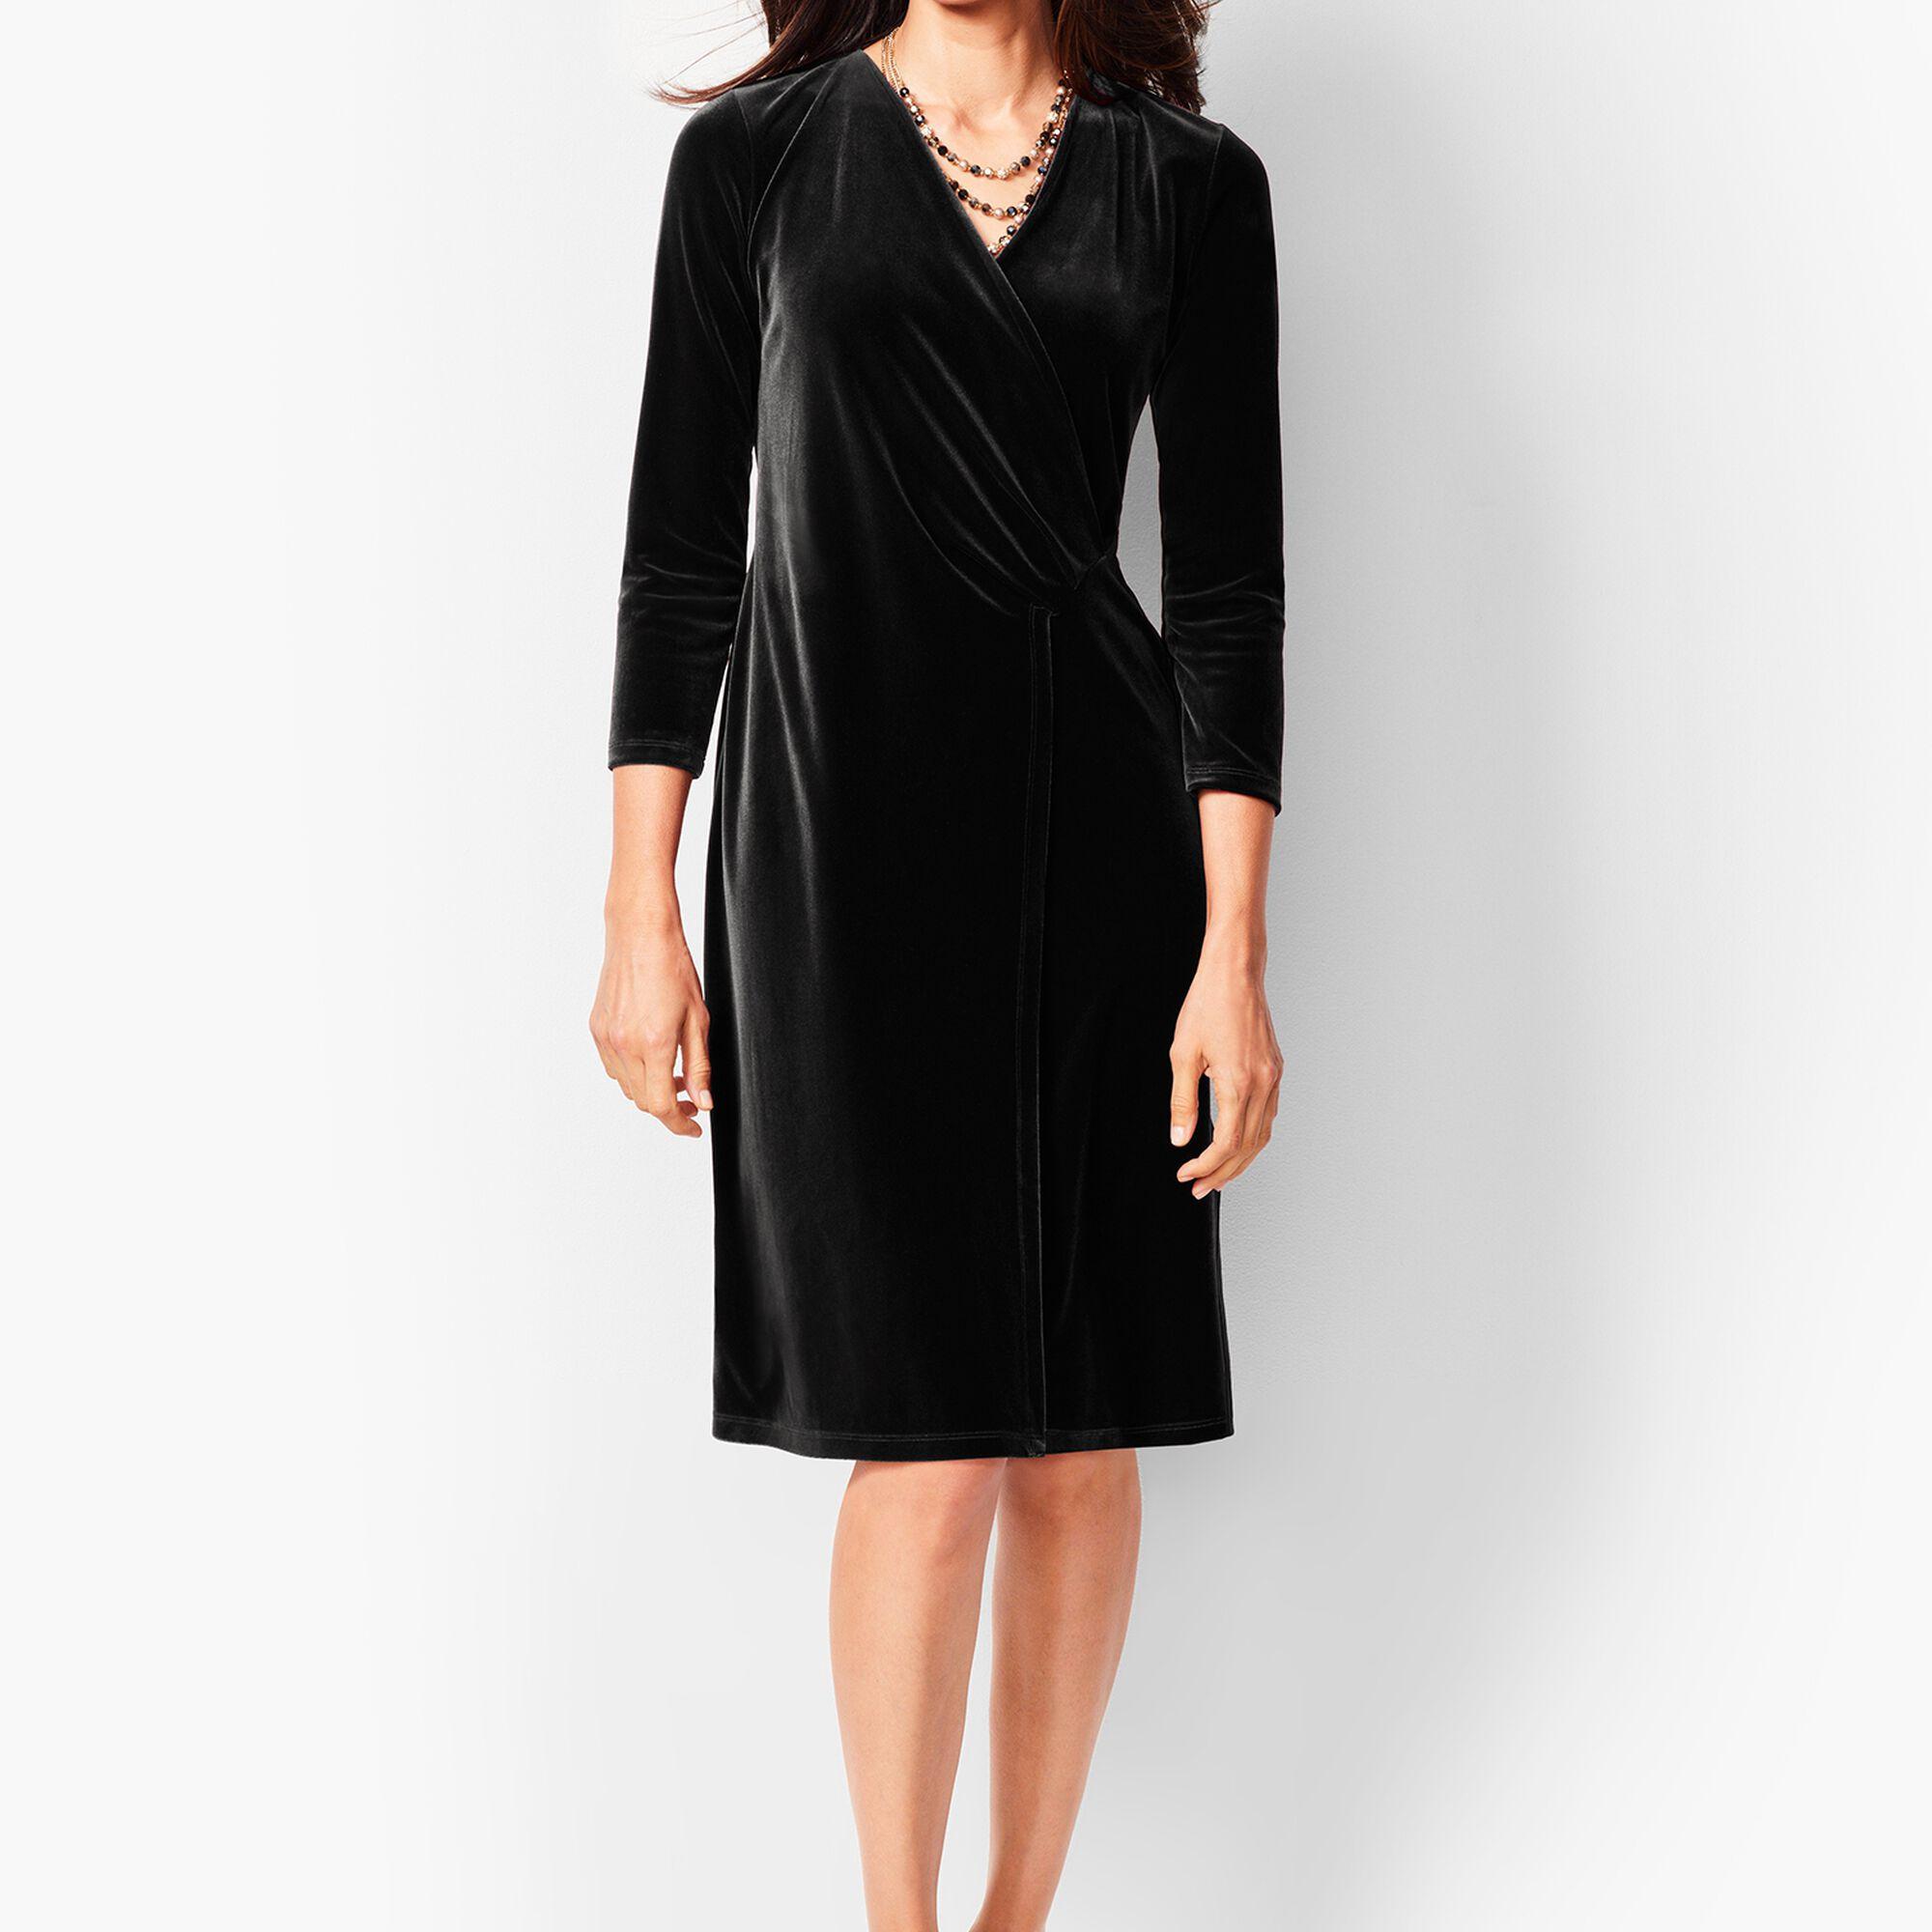 49978955e3 Velvet Faux-Wrap Sheath Dress | Talbots